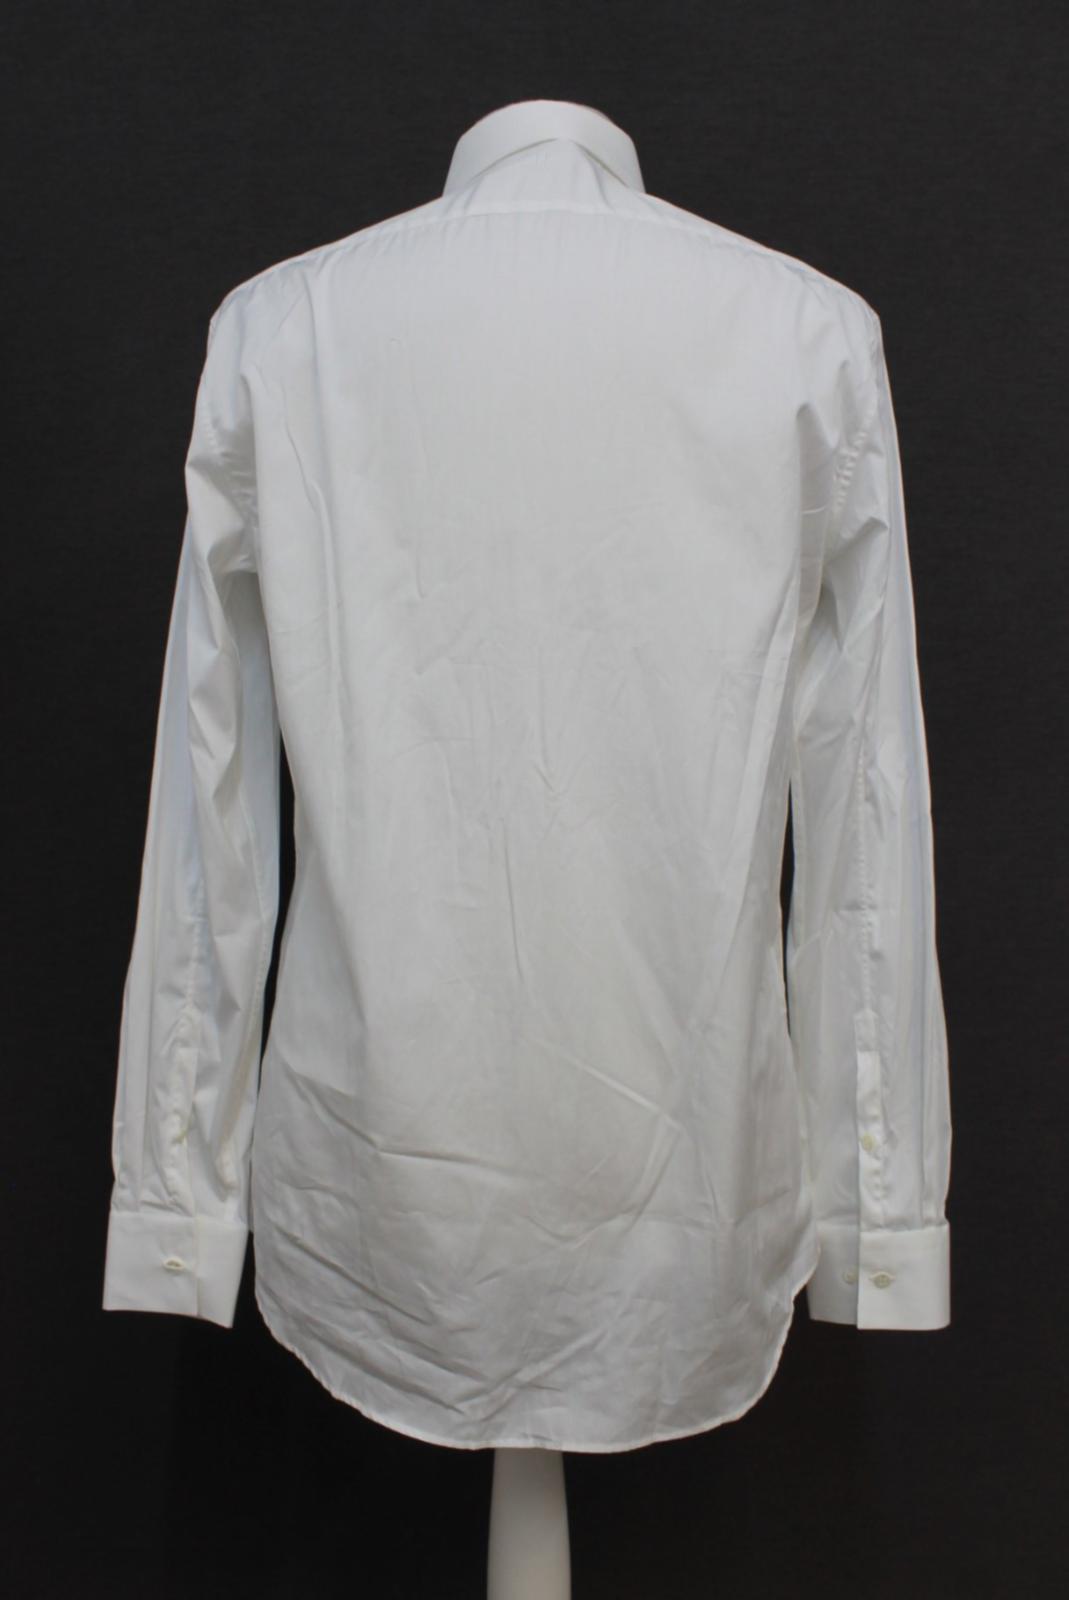 Neil-Barrett-para-hombre-calce-cenido-de-algodon-blanco-frontal-con-cremallera-con-cuello-camisa miniatura 5